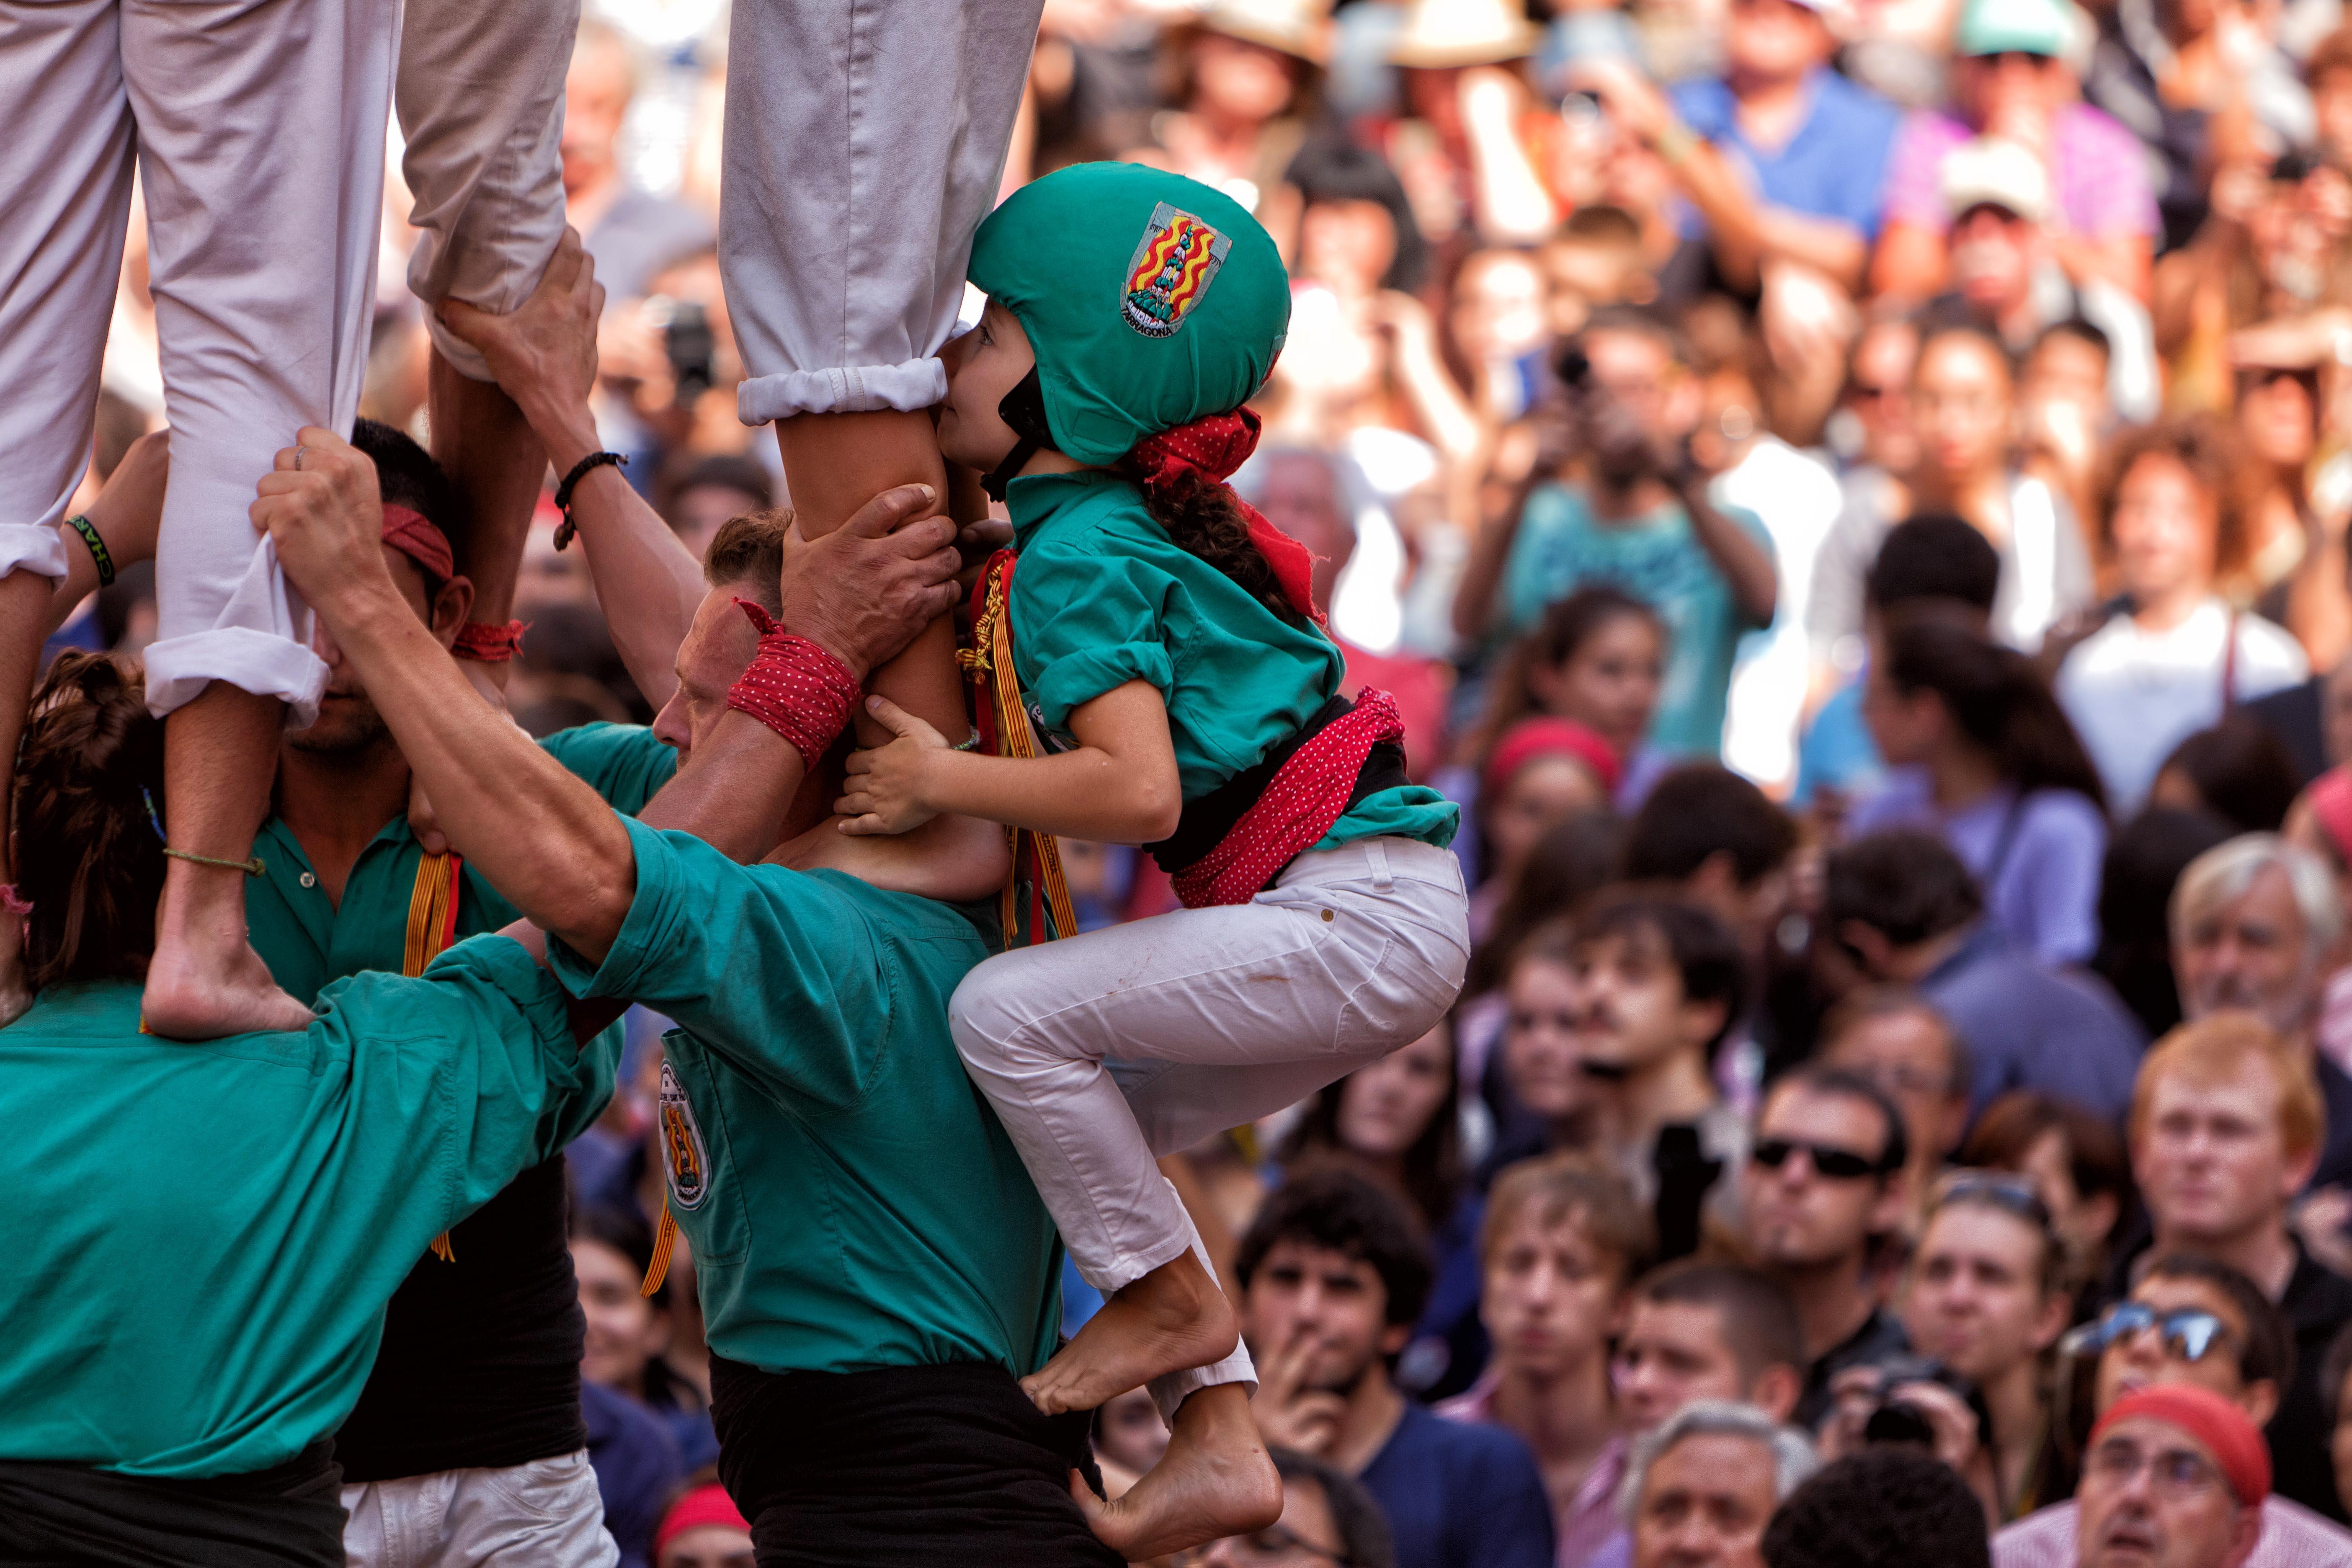 Tarragona, Santa Tecla, Castellers © Manel R. i Tarragona turisme